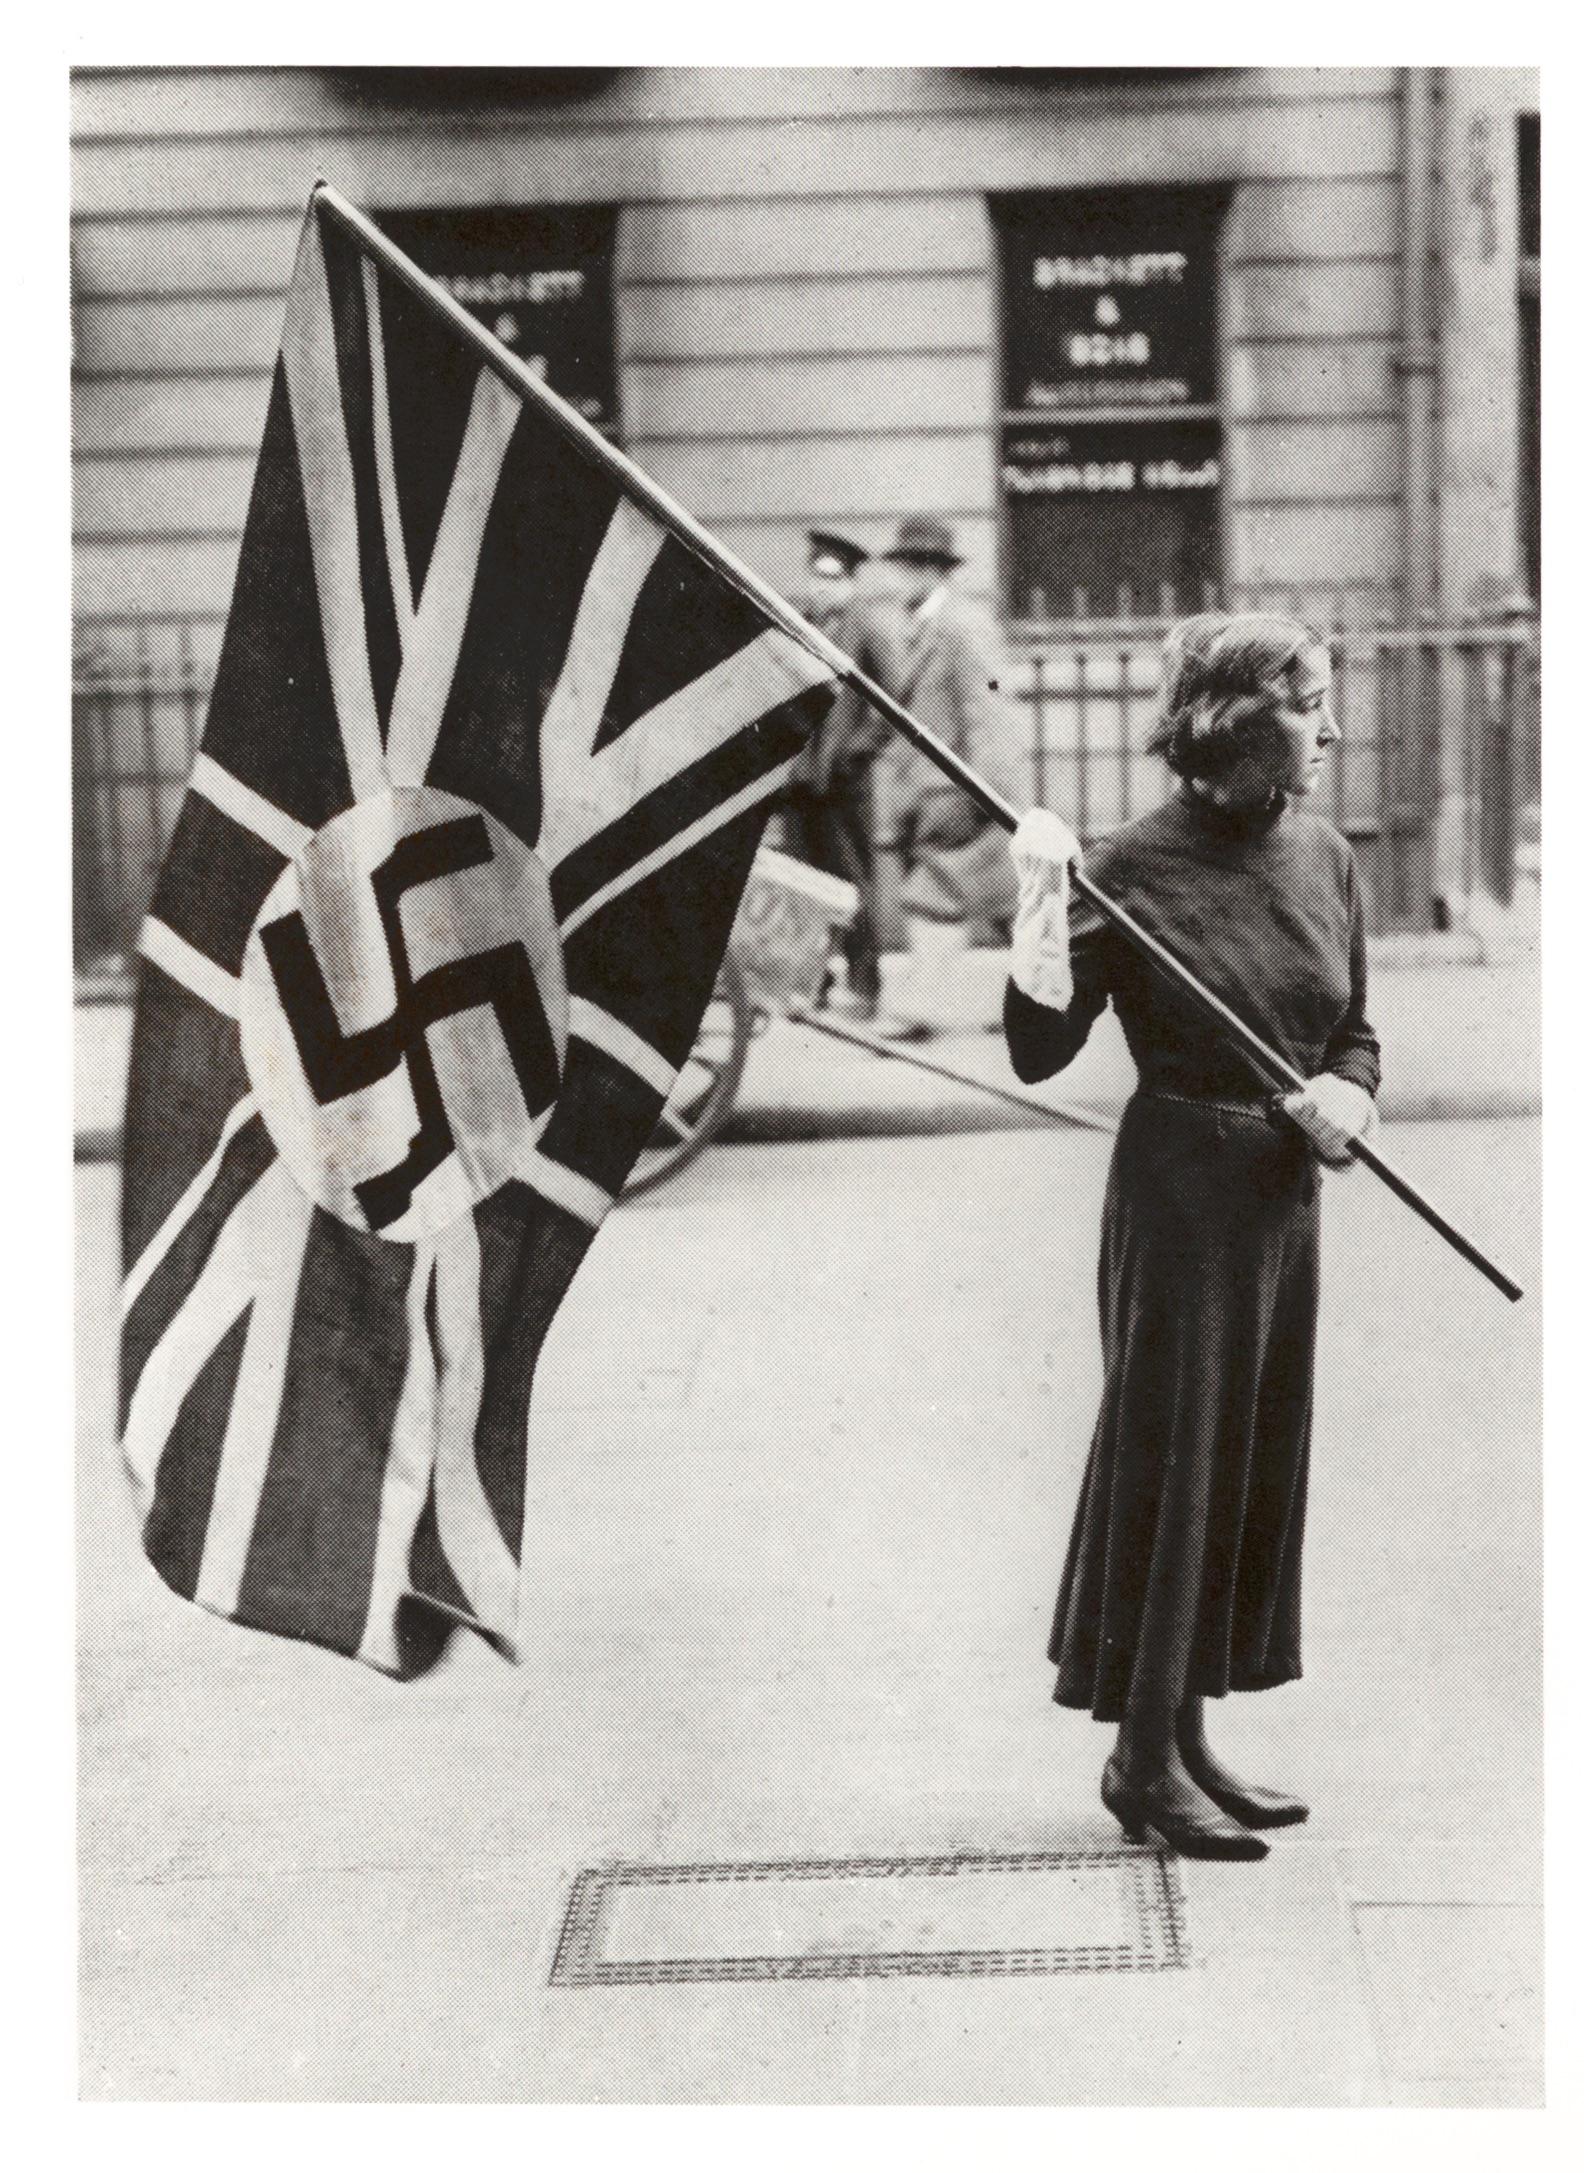 Lady flying British Union of Fascist flag 1930s